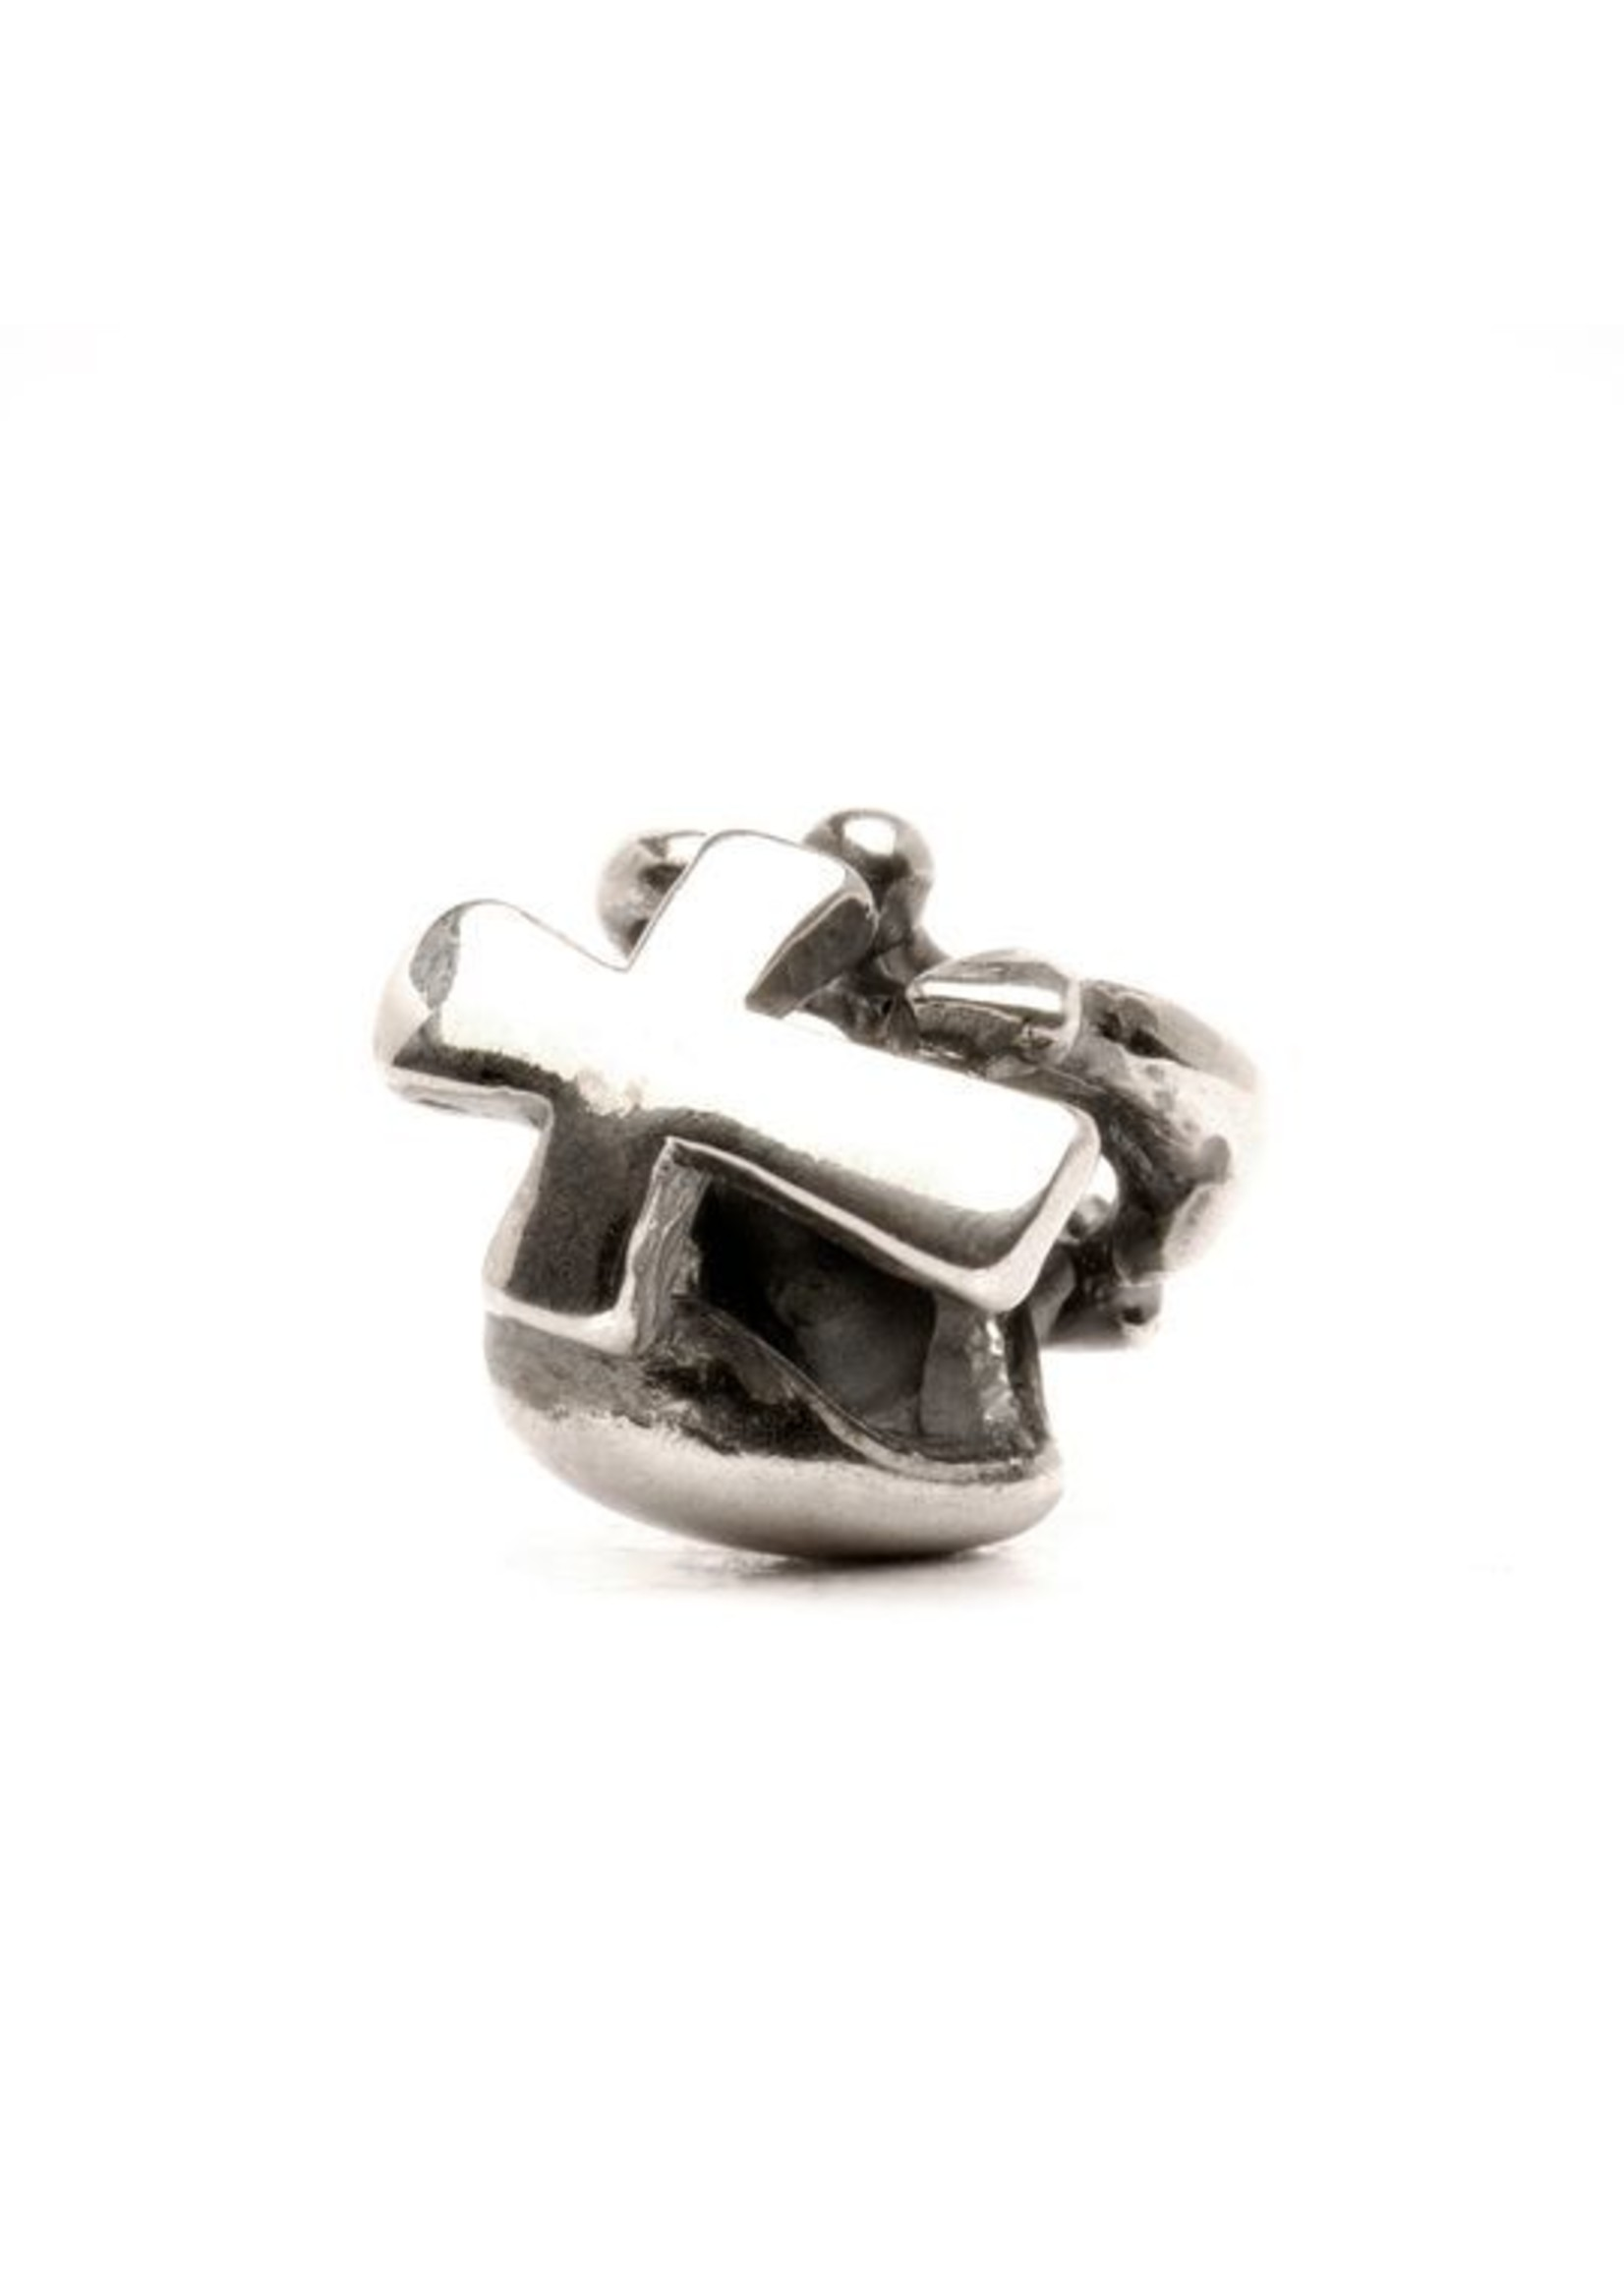 Trollbeads Faith, Hope & Charity, Silver